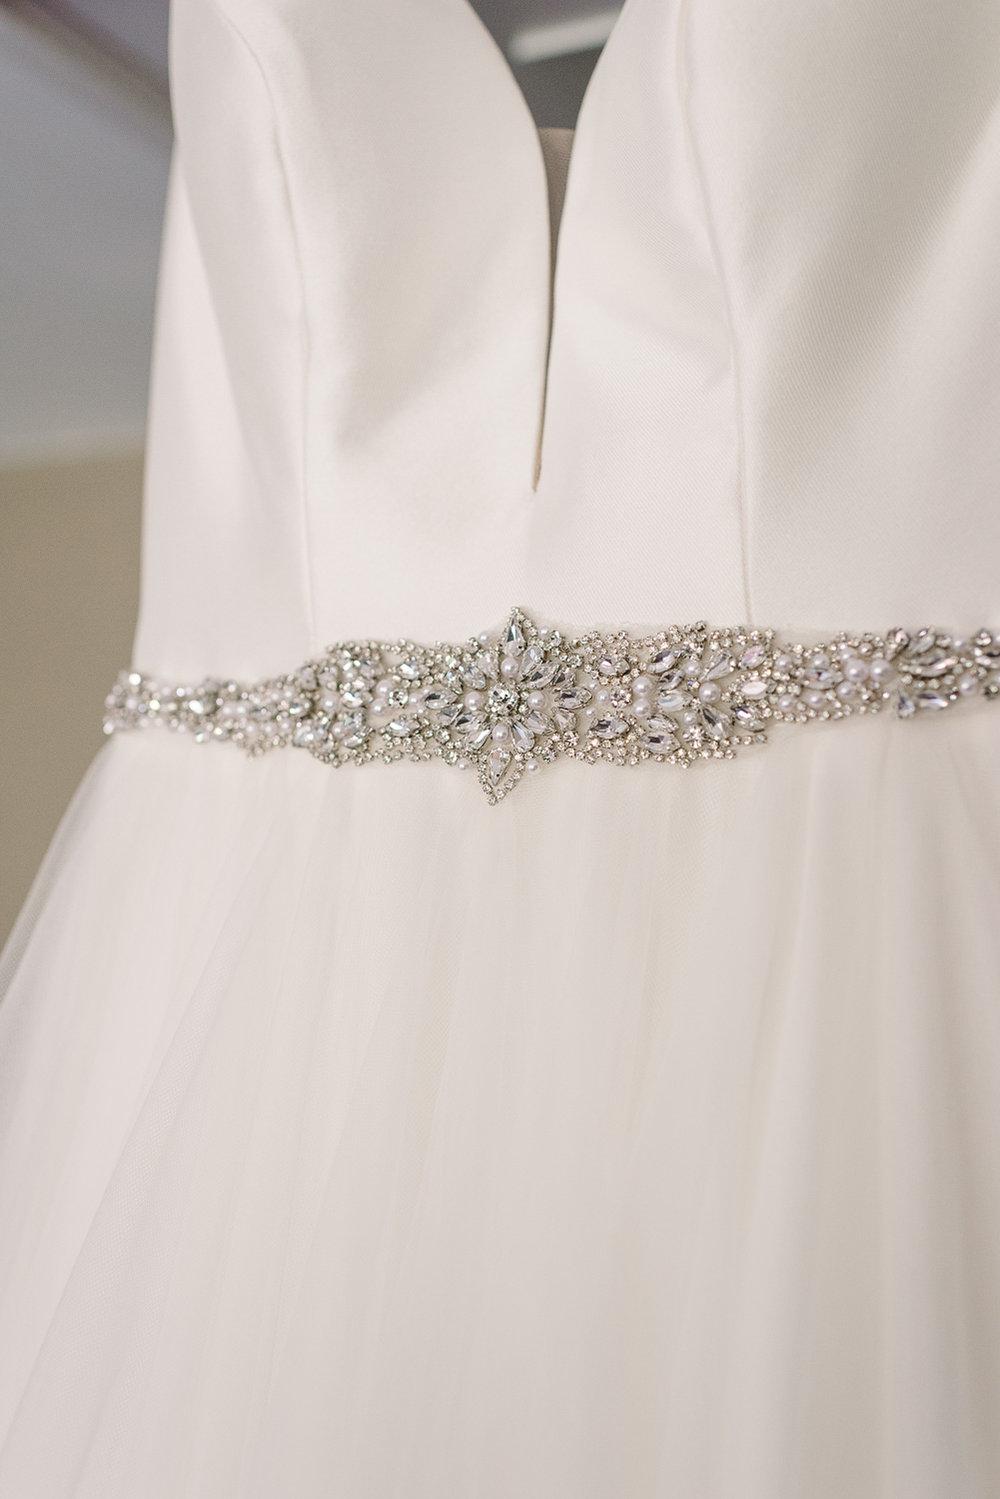 jewelled belt on bride's wedding dress